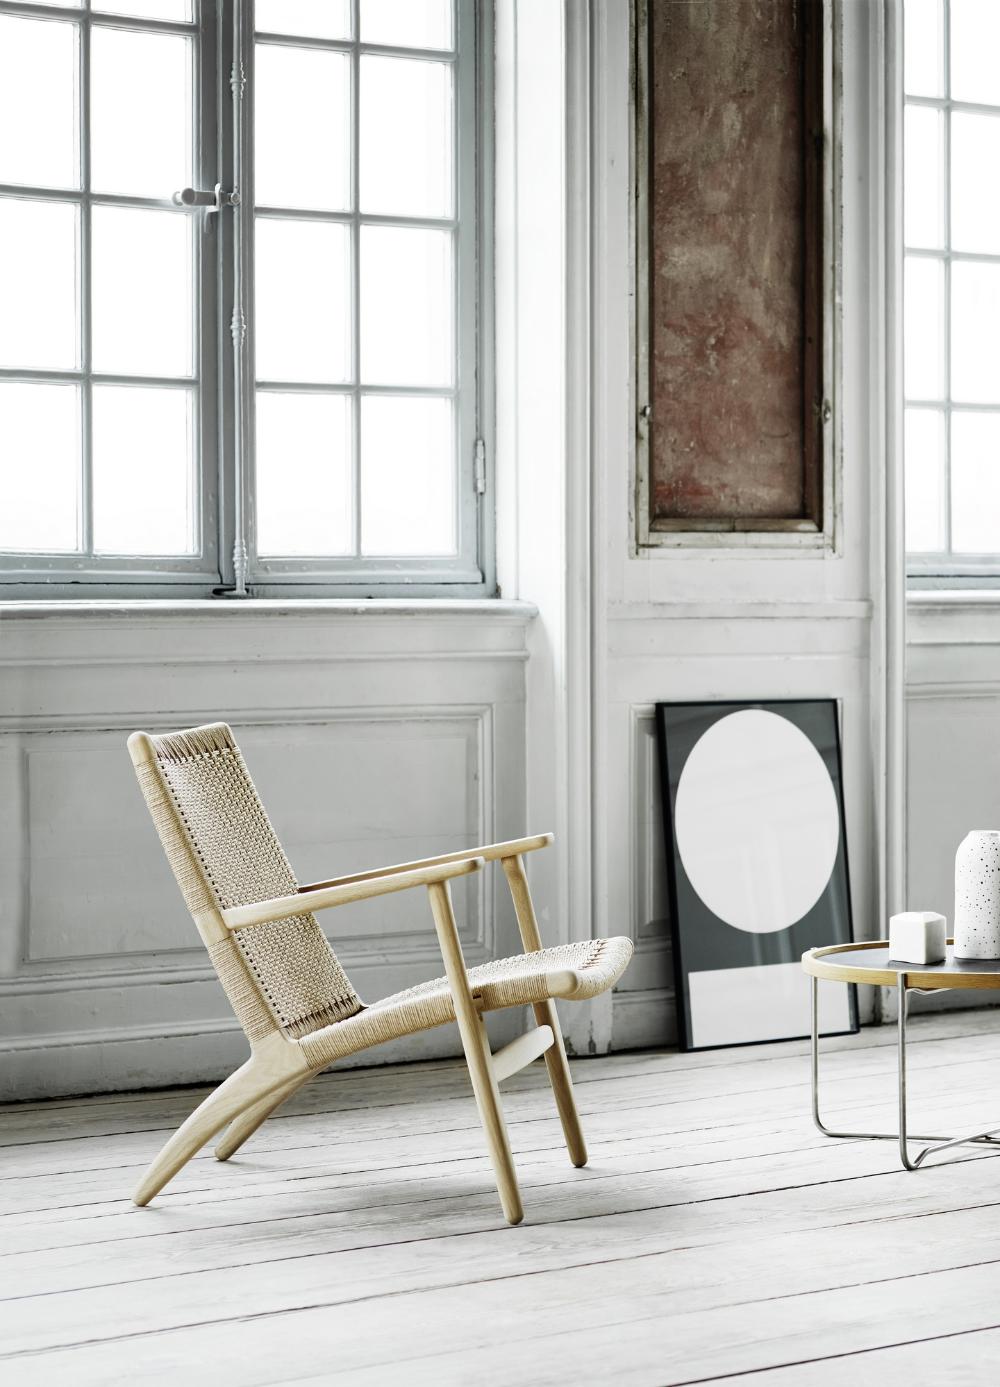 CH25 lounge chair   by Hans J. Wegner   Carl Hansen & Søn in